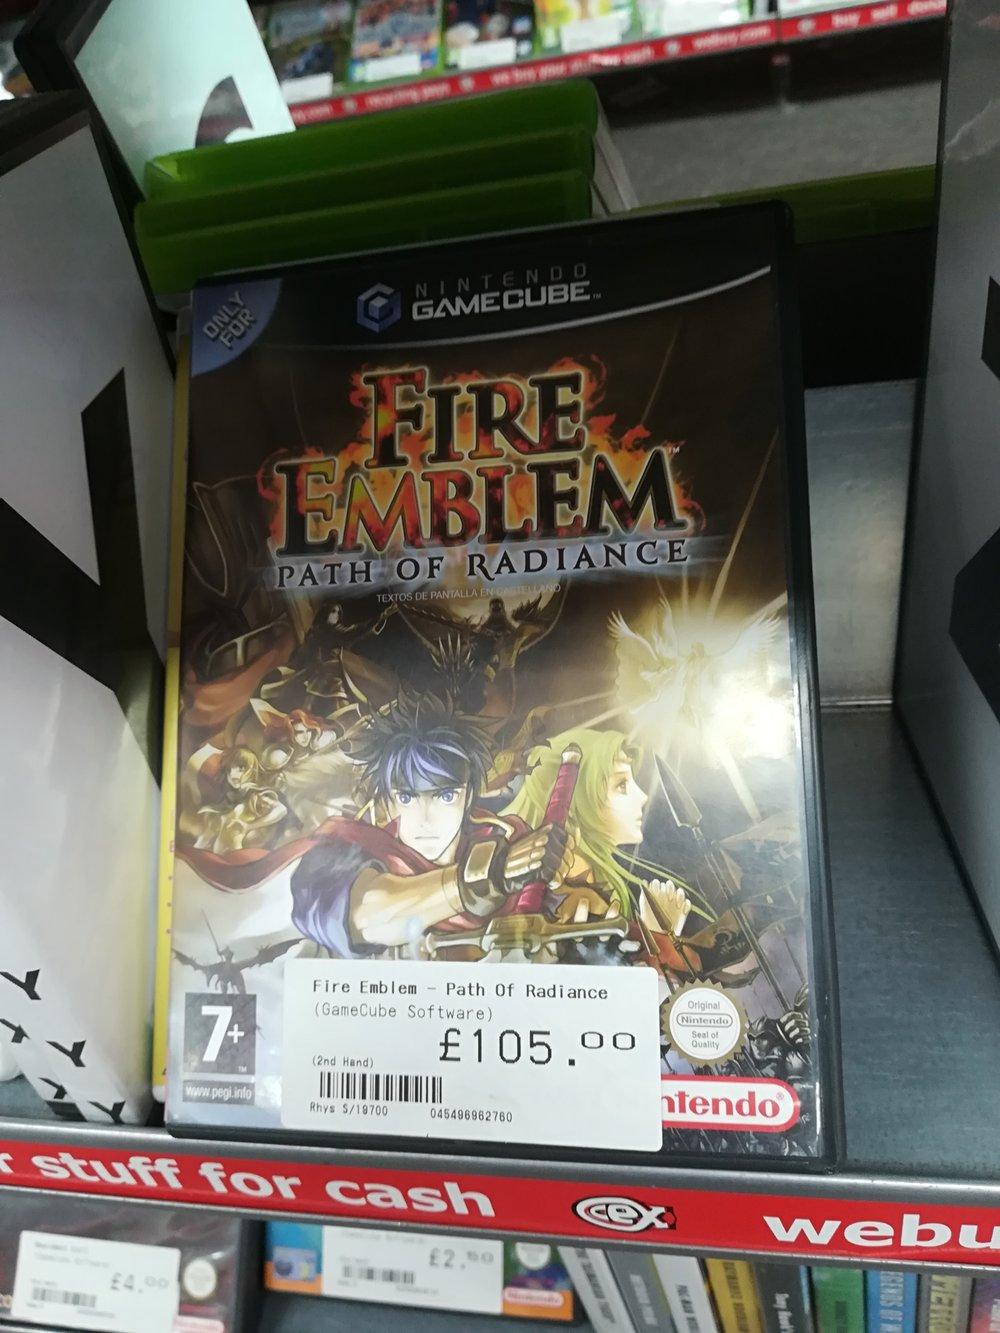 Fire Emblem: Path of Radiance 5/7/18